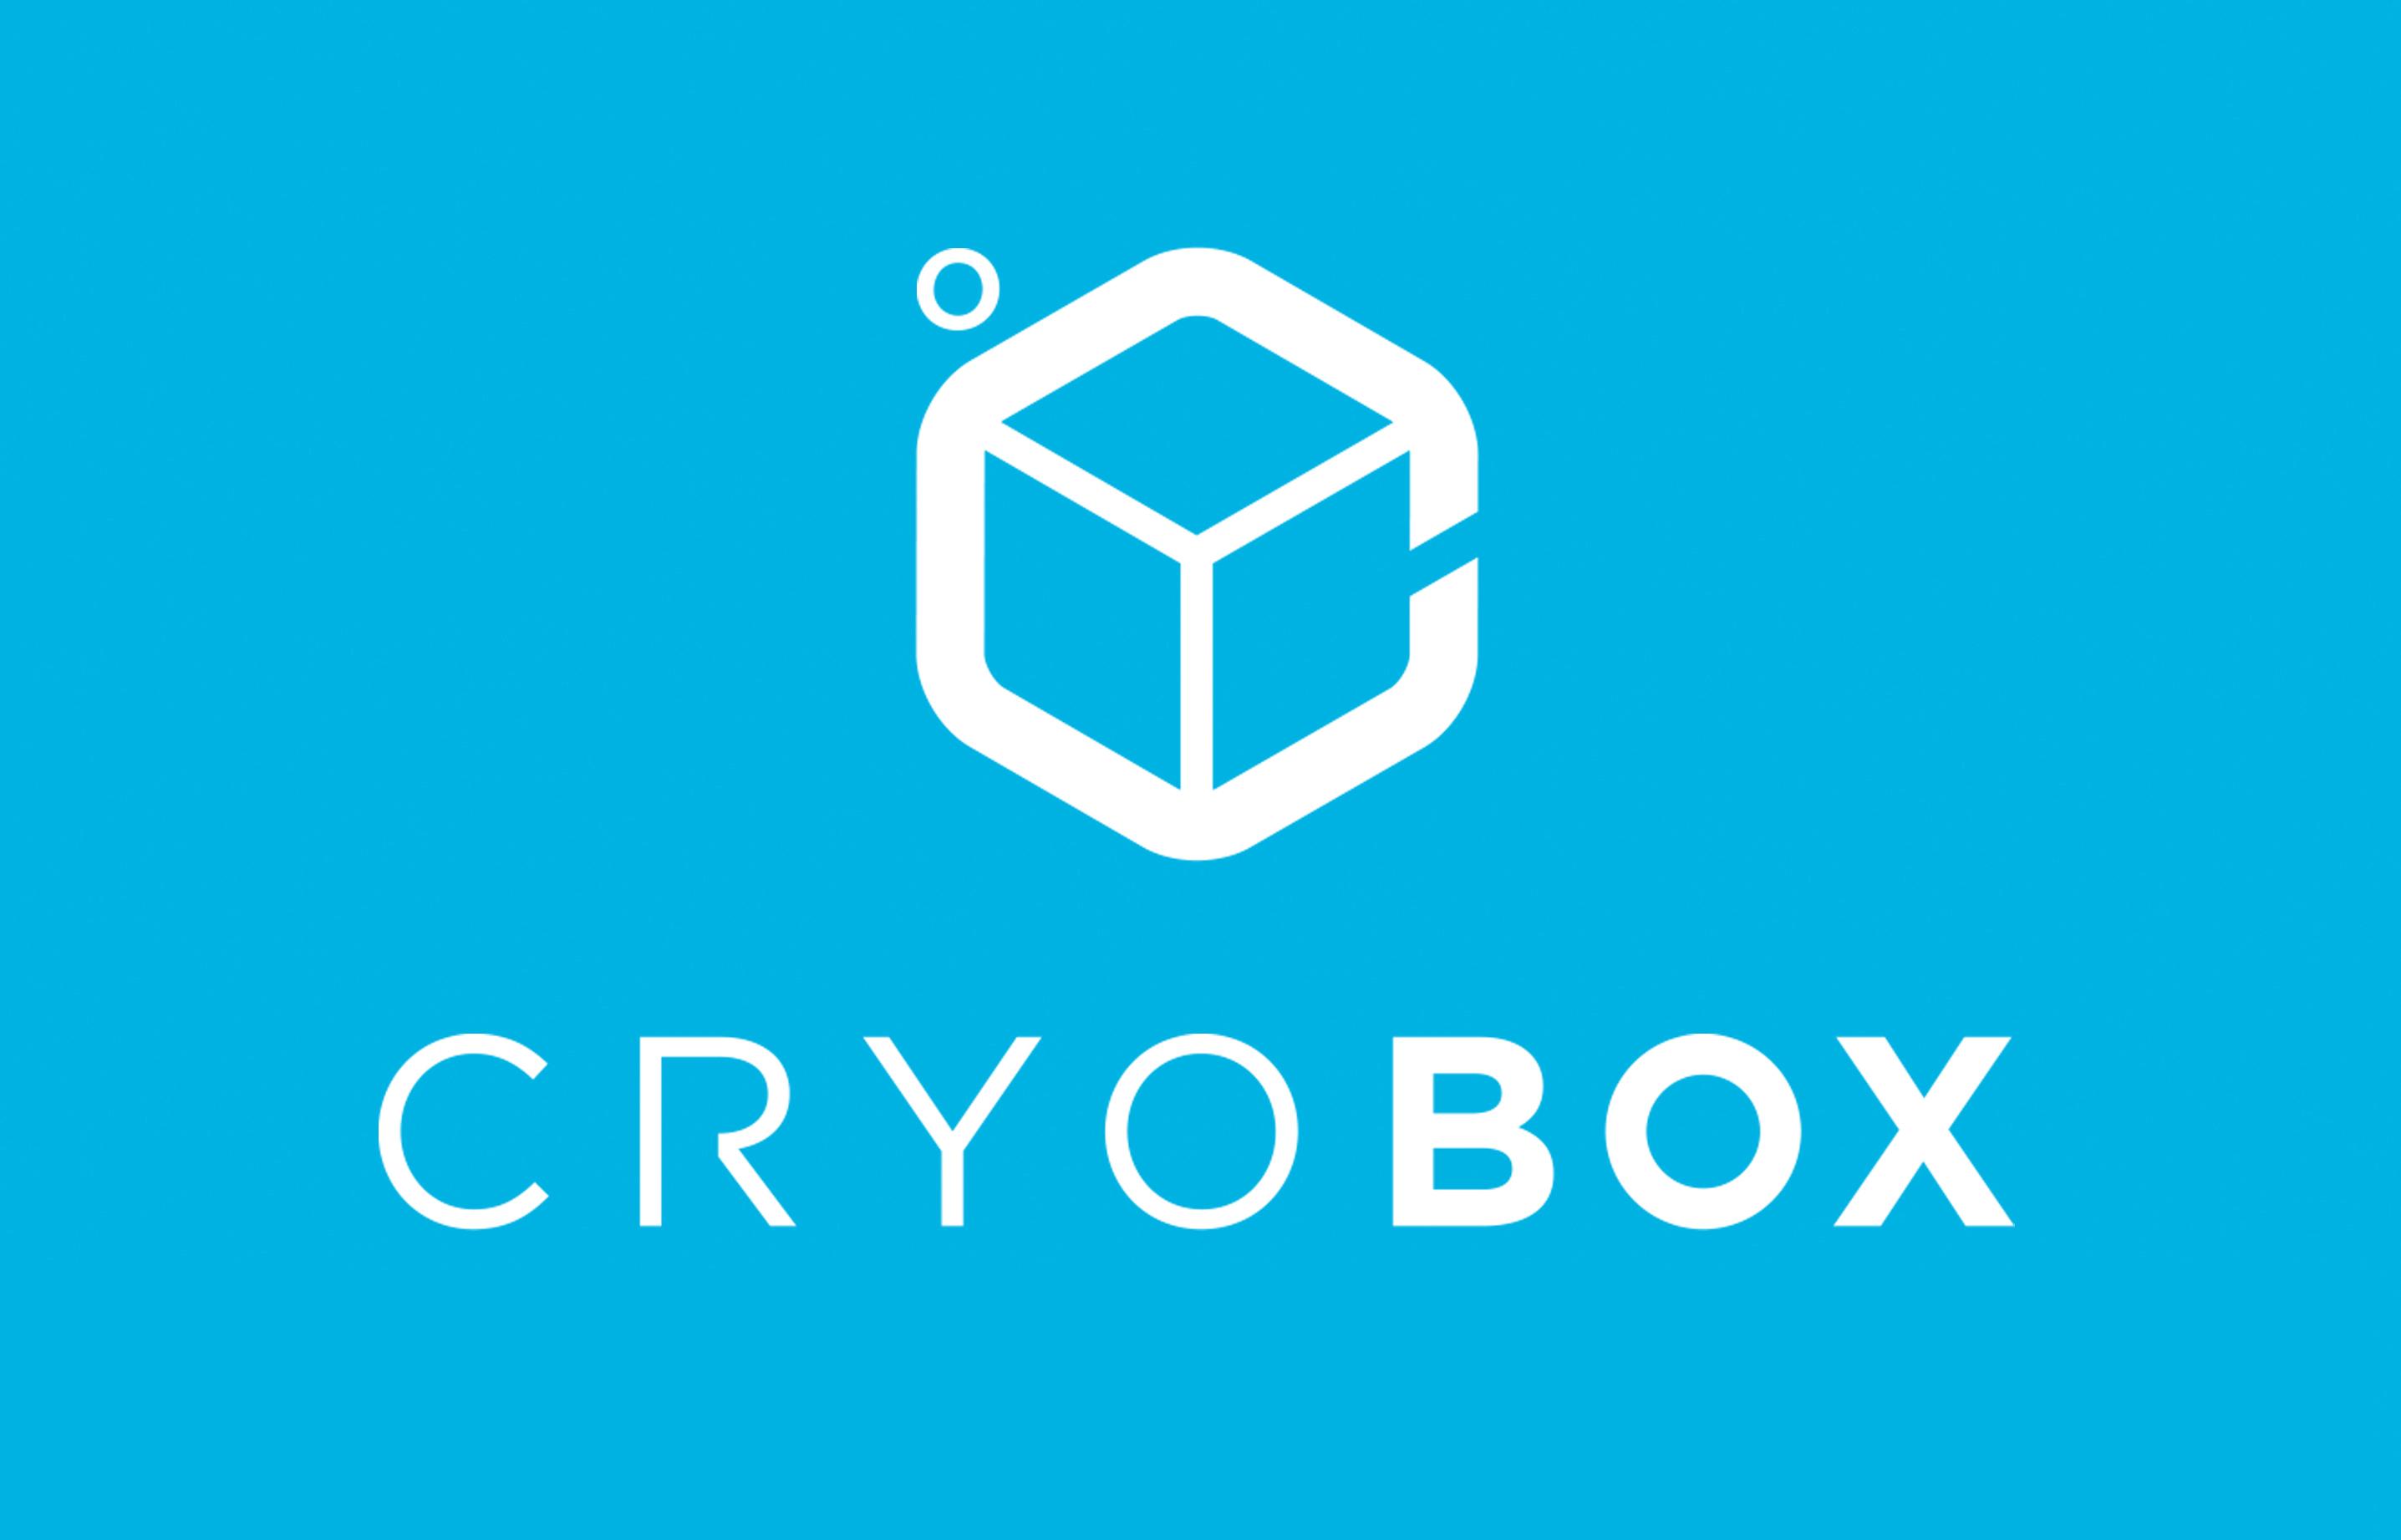 CryoBox